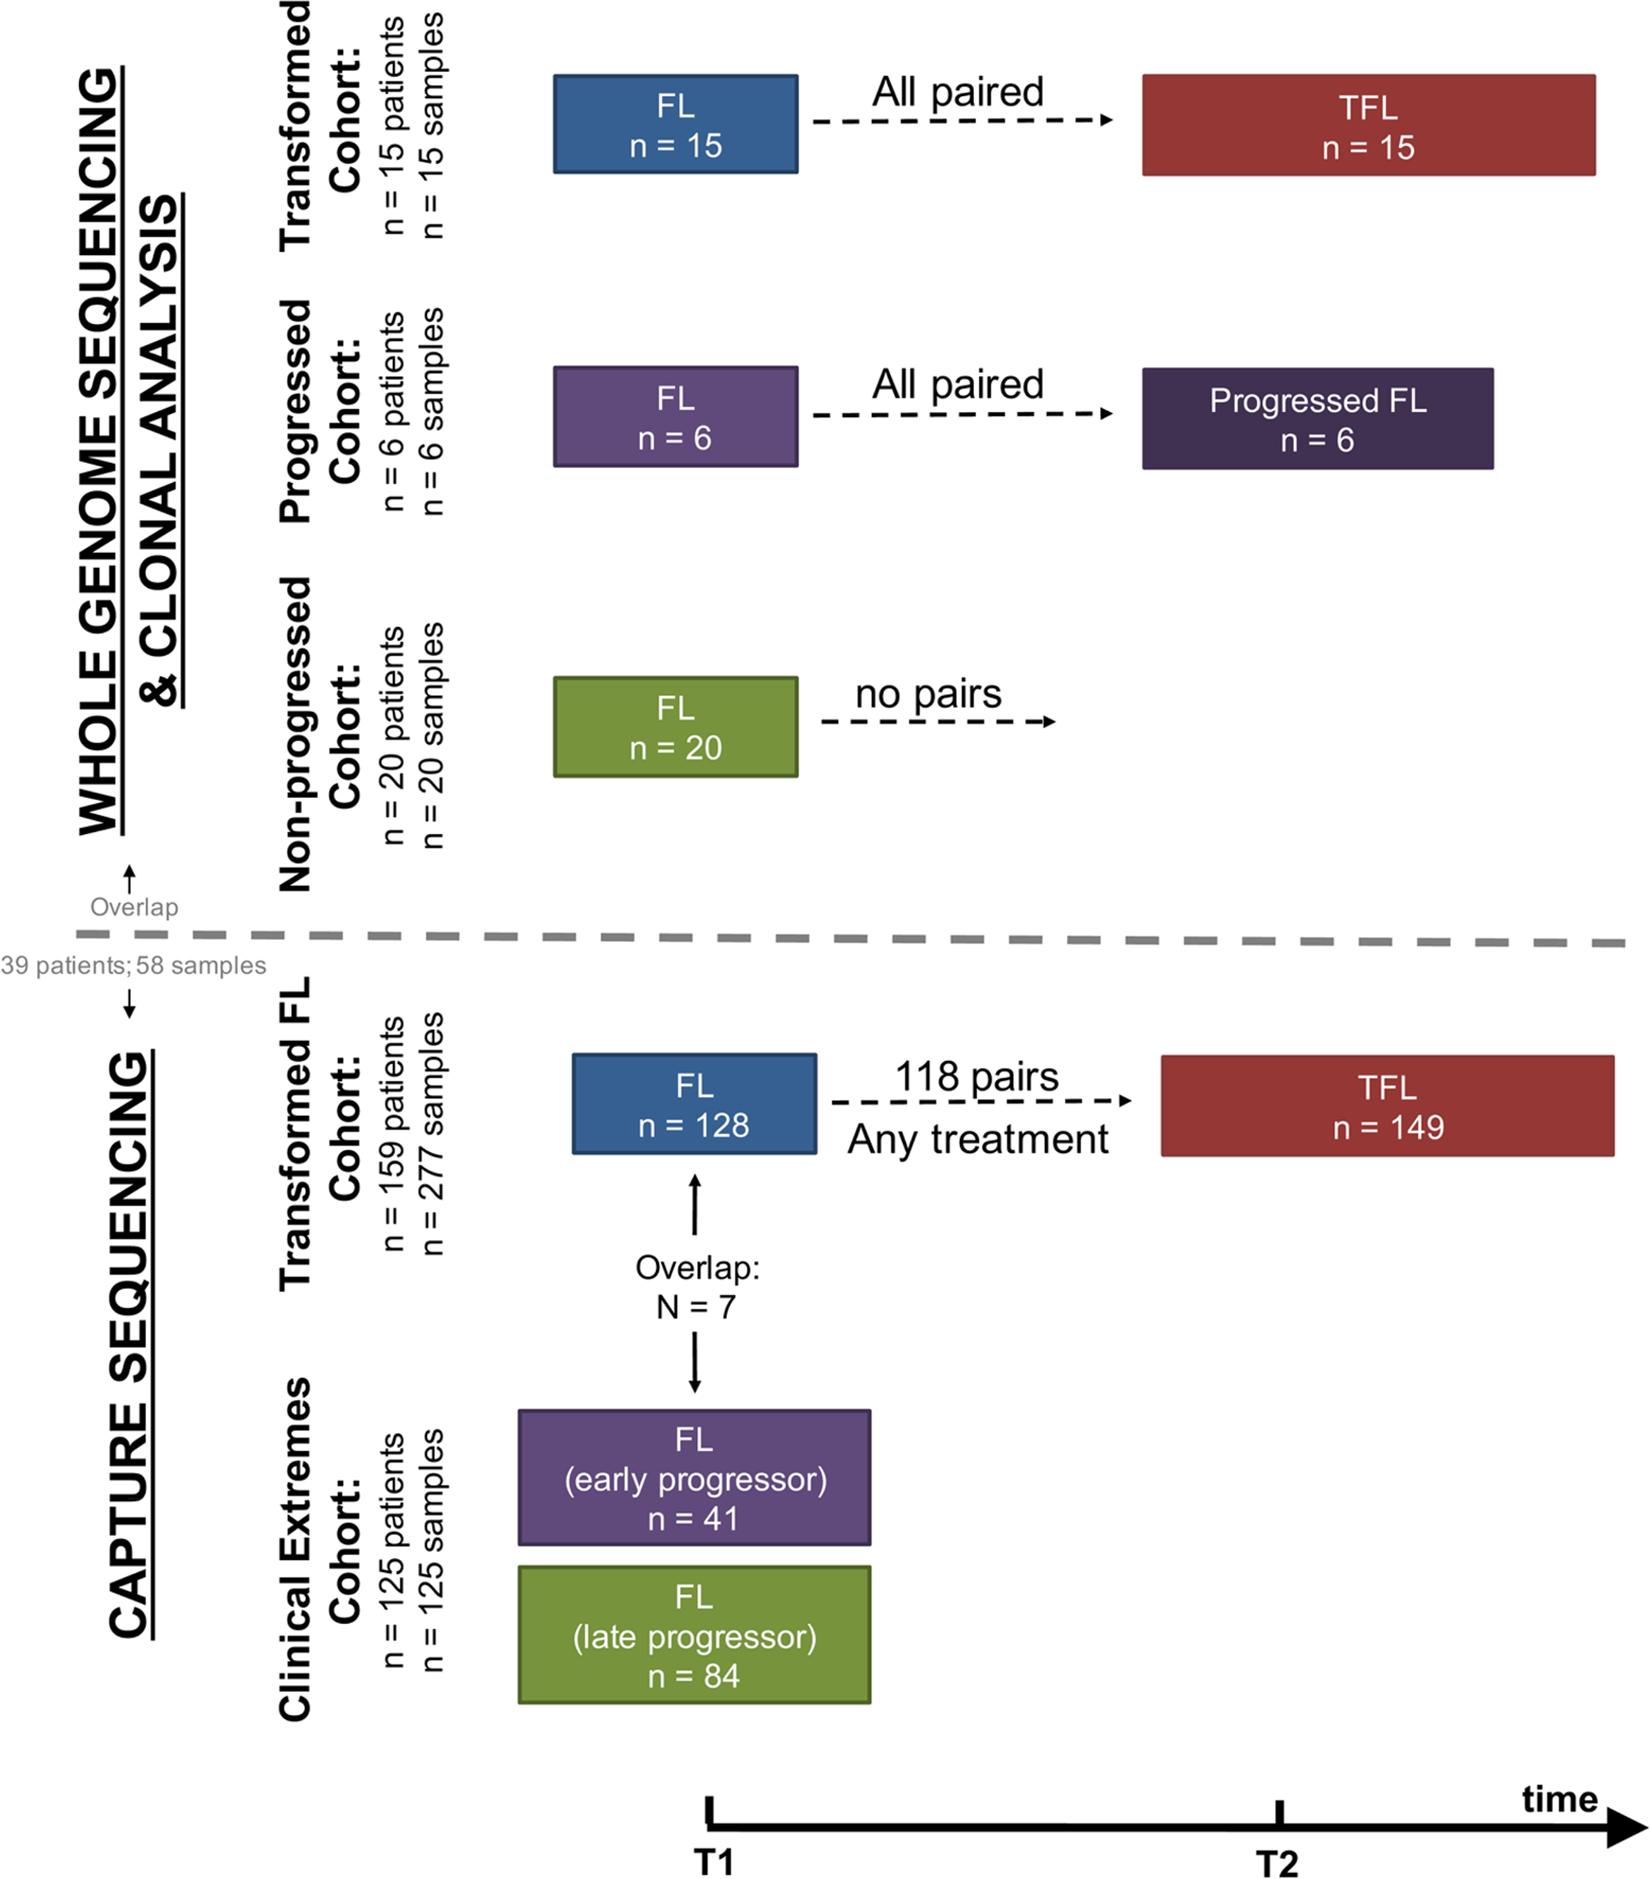 Study cohort overview.